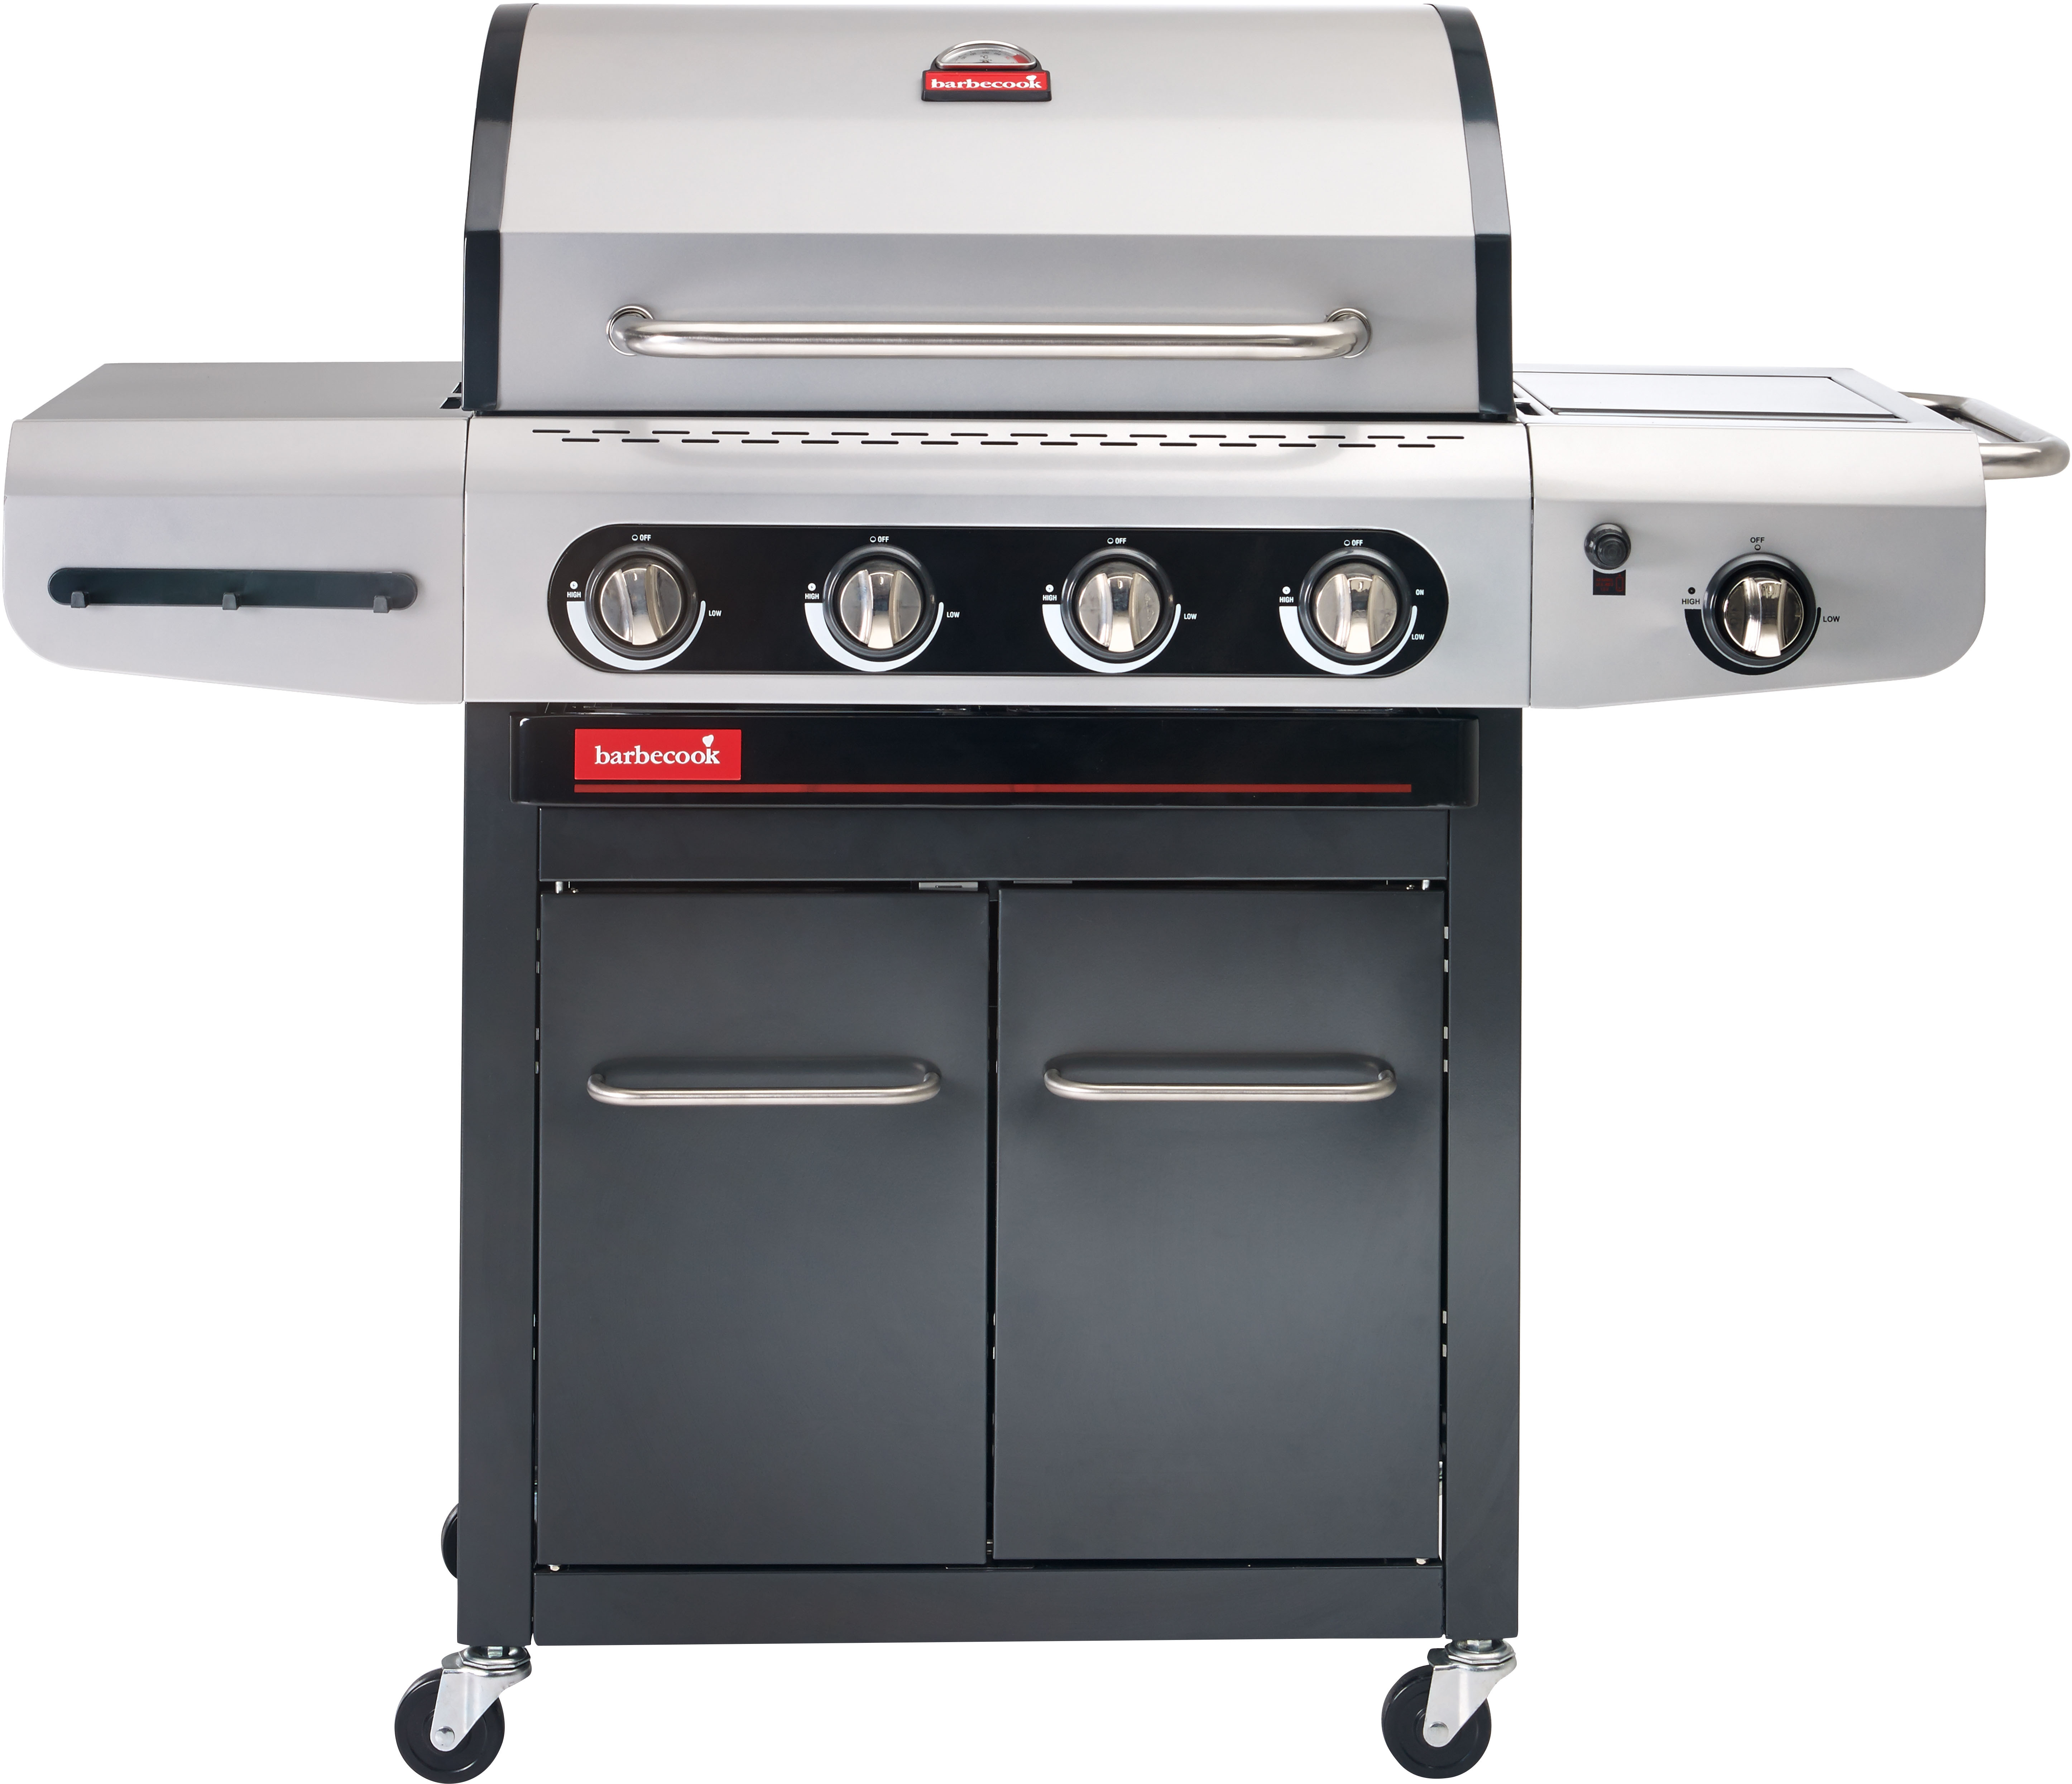 Barbecues Barbecook Siesta 412